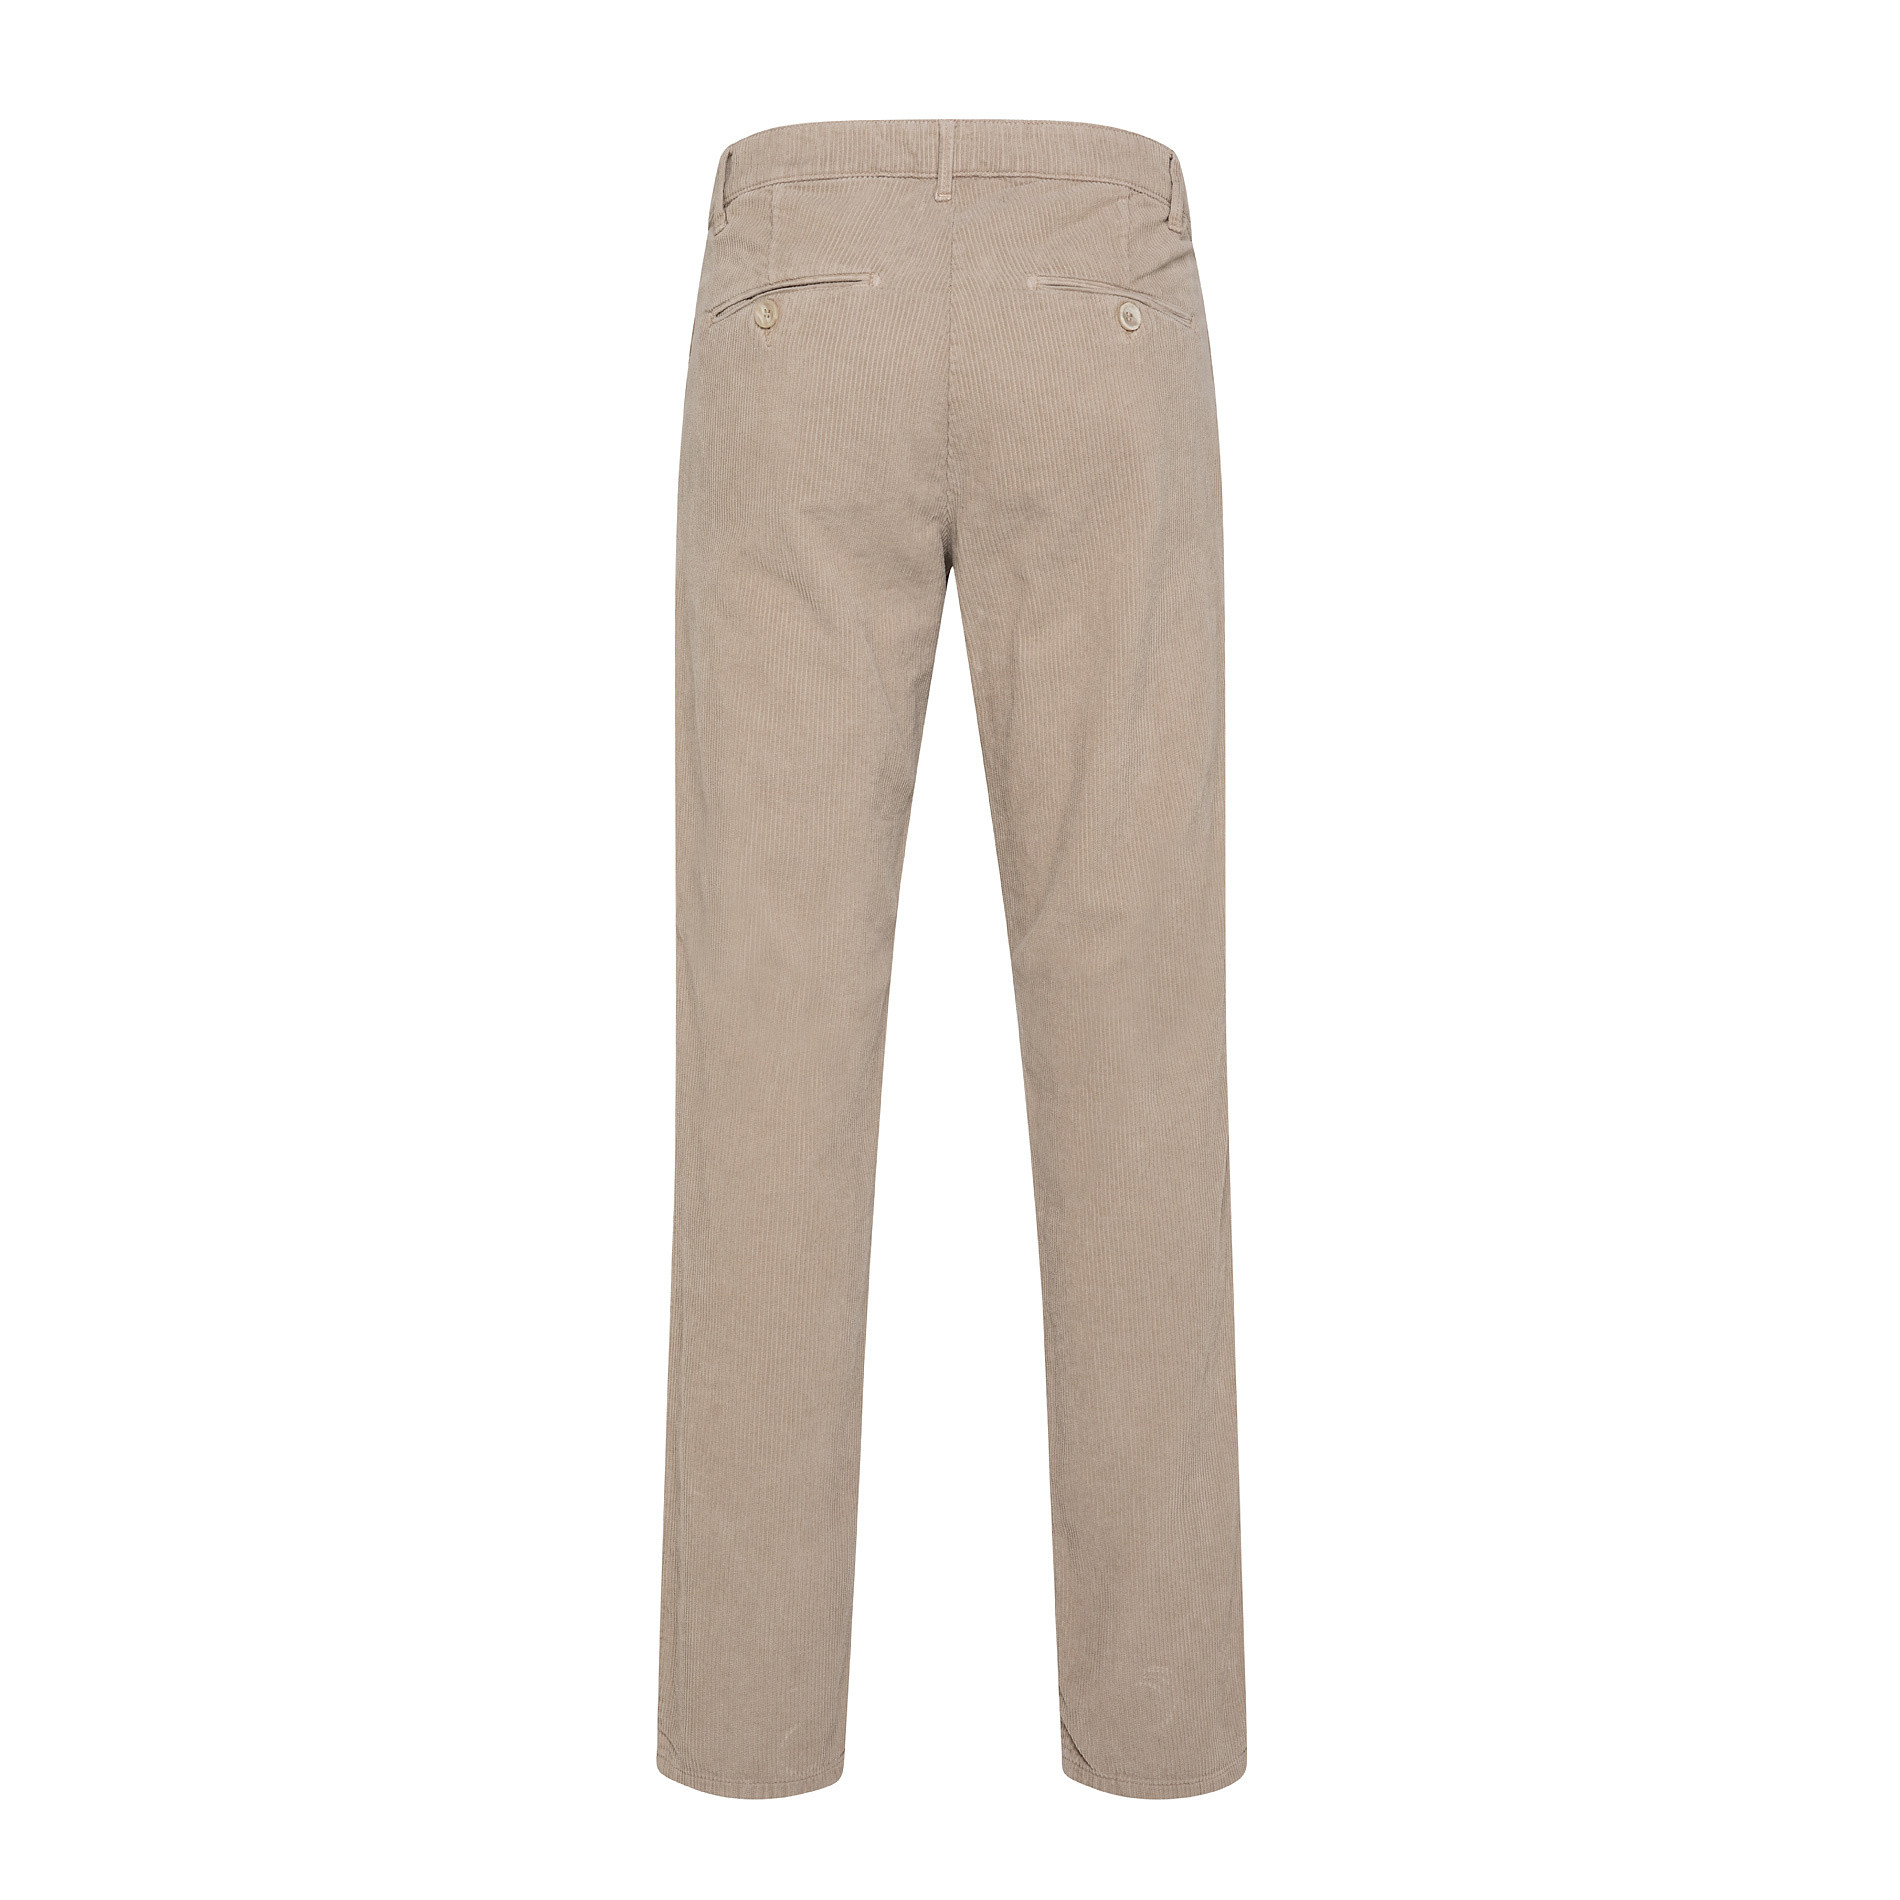 Pantaloni chino velluto stretch, Beige chiaro, large image number 1